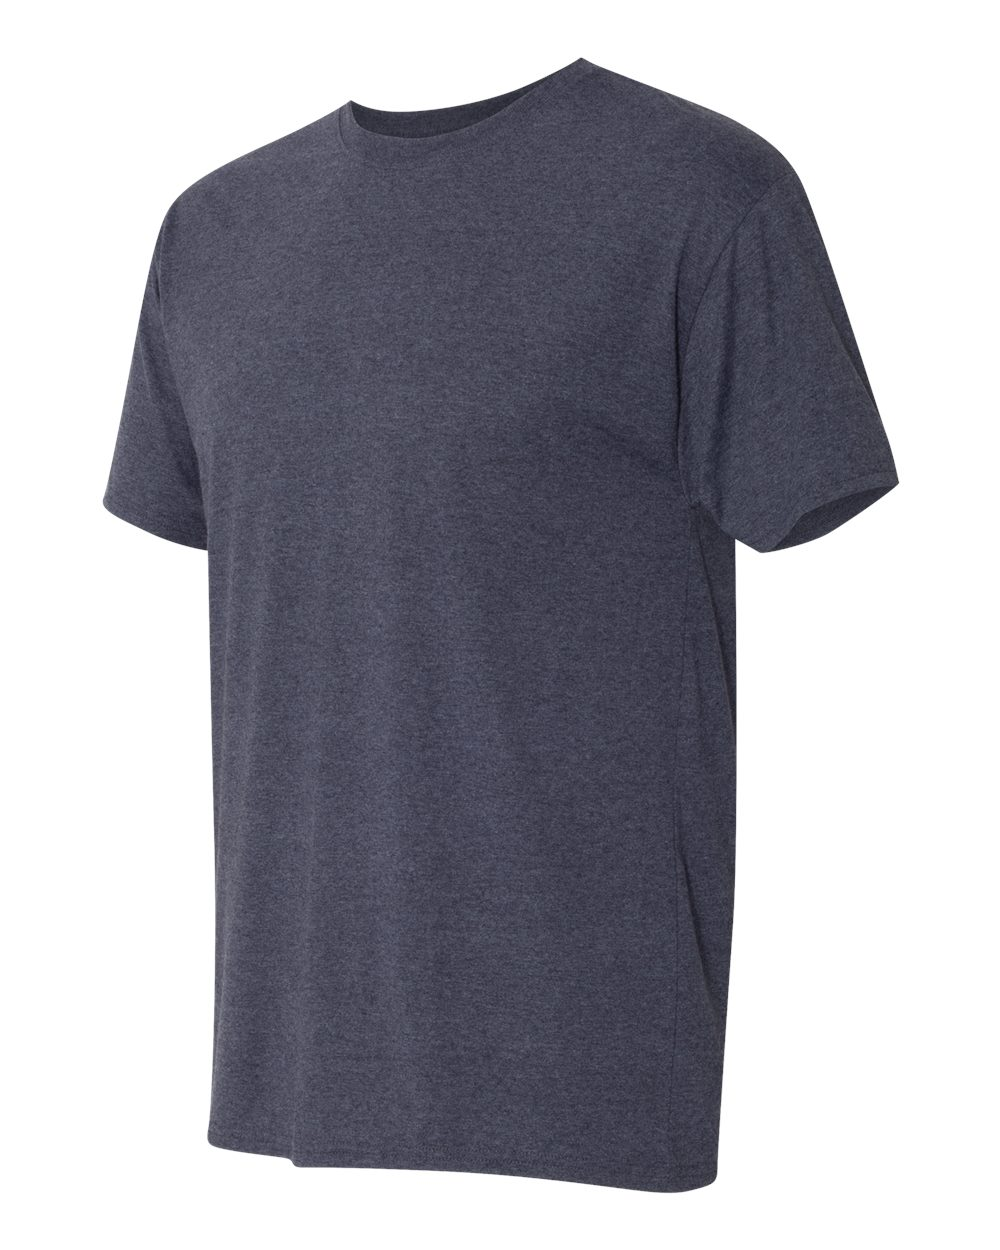 Hanes-Men-039-s-X-Temp-Triblend-T-Shirt-With-Fresh-Iq-42TB-S-3XL thumbnail 20